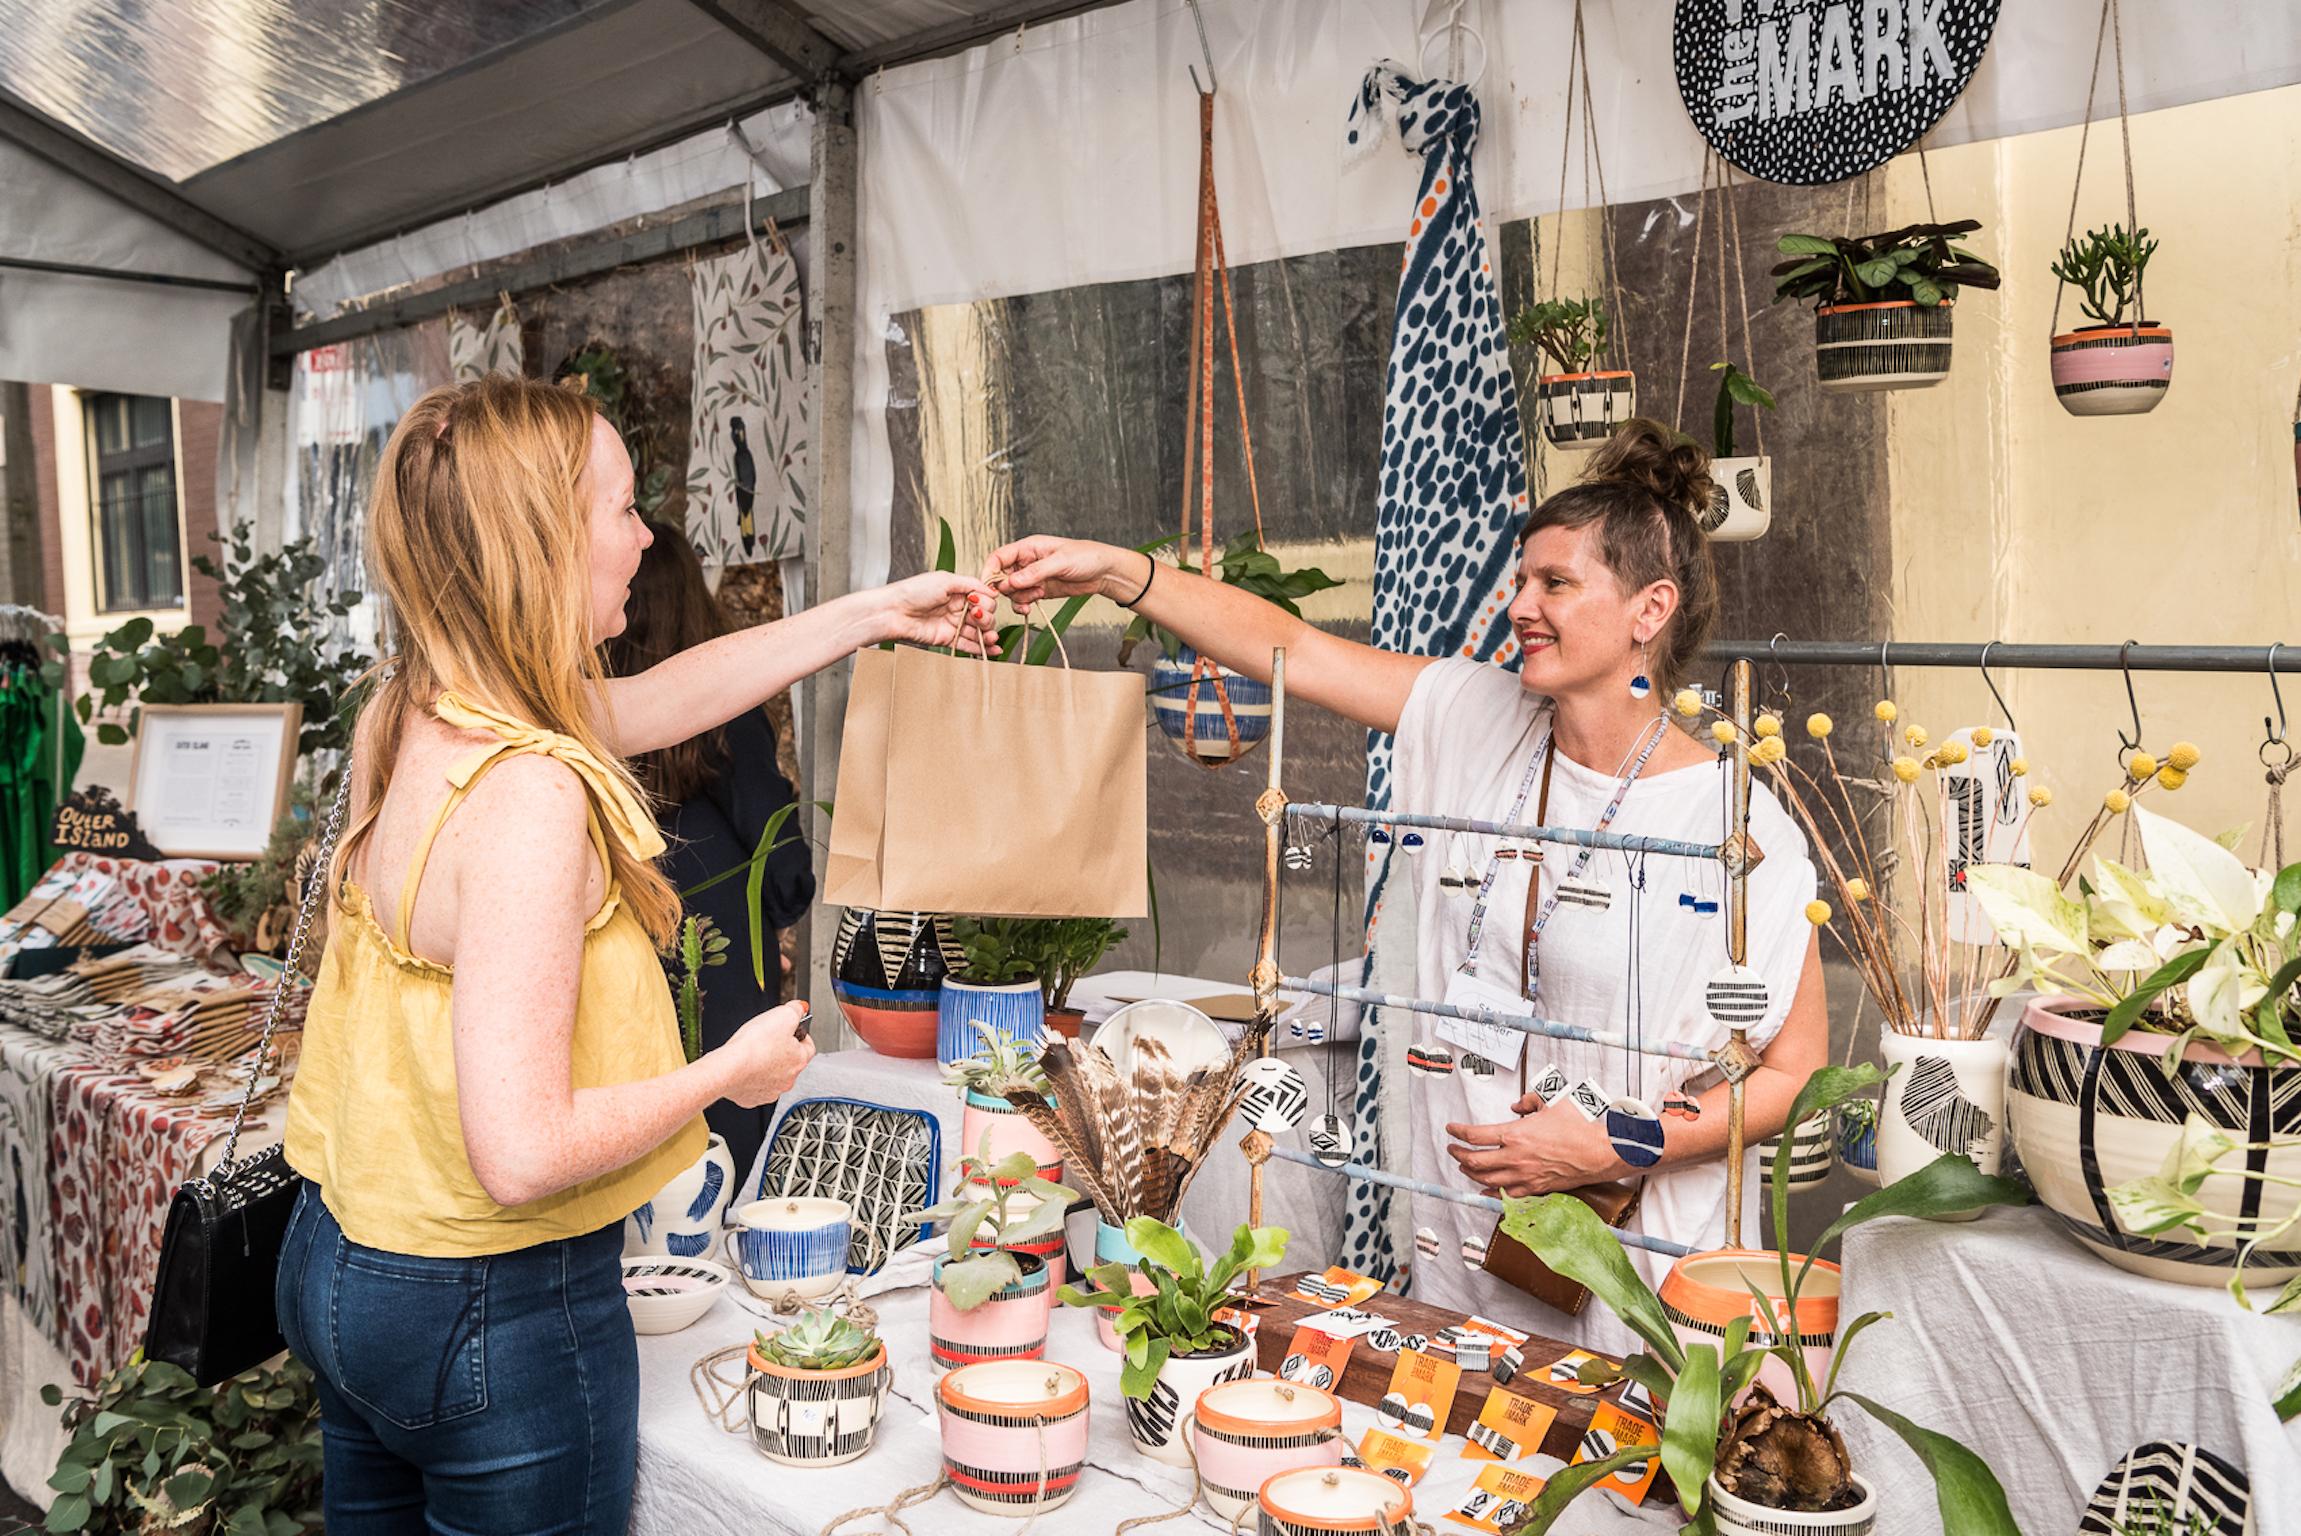 https://sydney-craft-week-prd.s3.amazonaws.com/media/uploads/images/ADC_Maker_Market_2018__Photo_by_Rhiannon_Hopeley.jpg